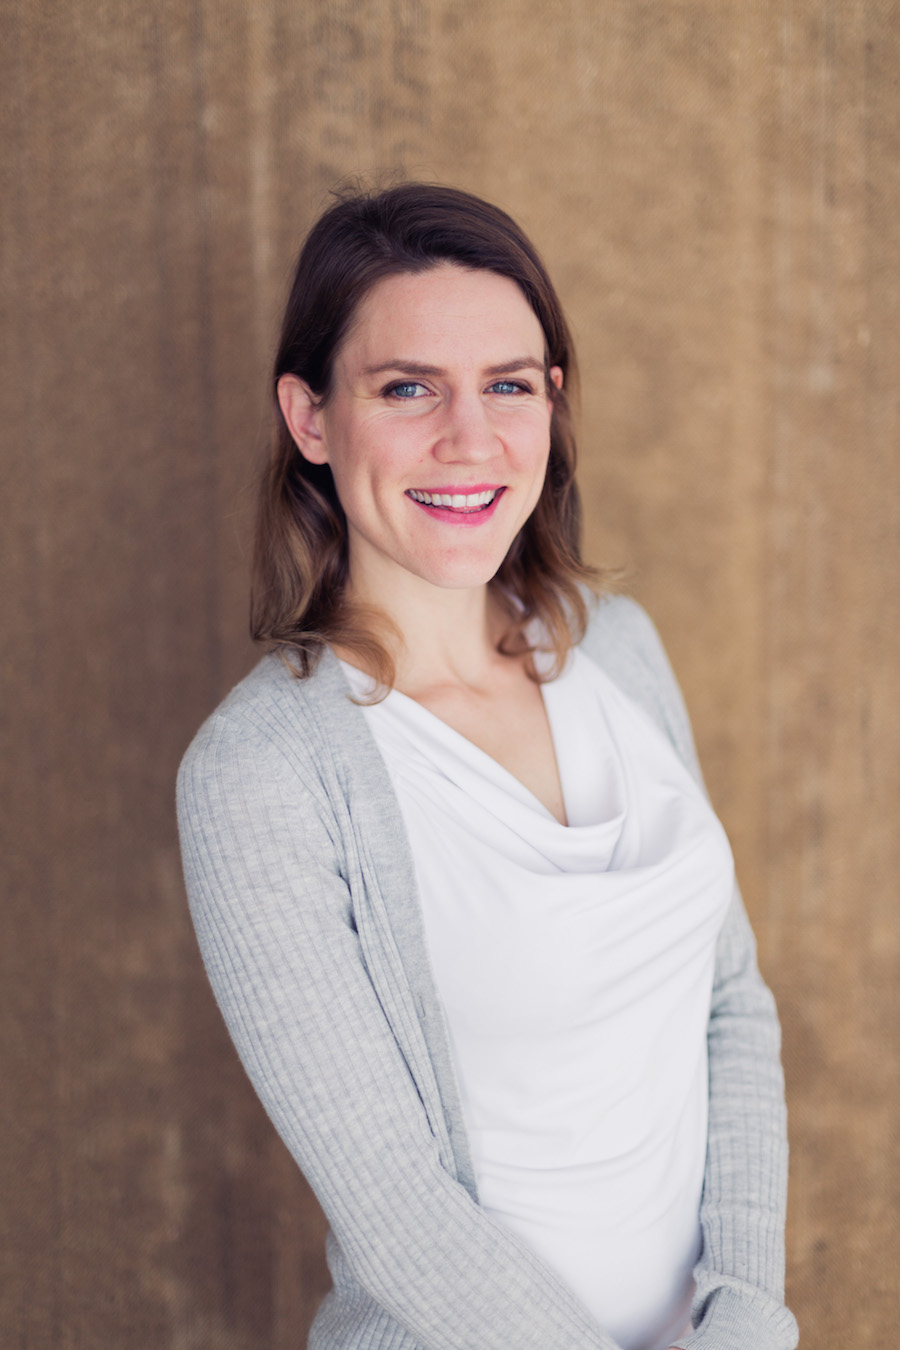 Allie Antkowiak Rithm Student